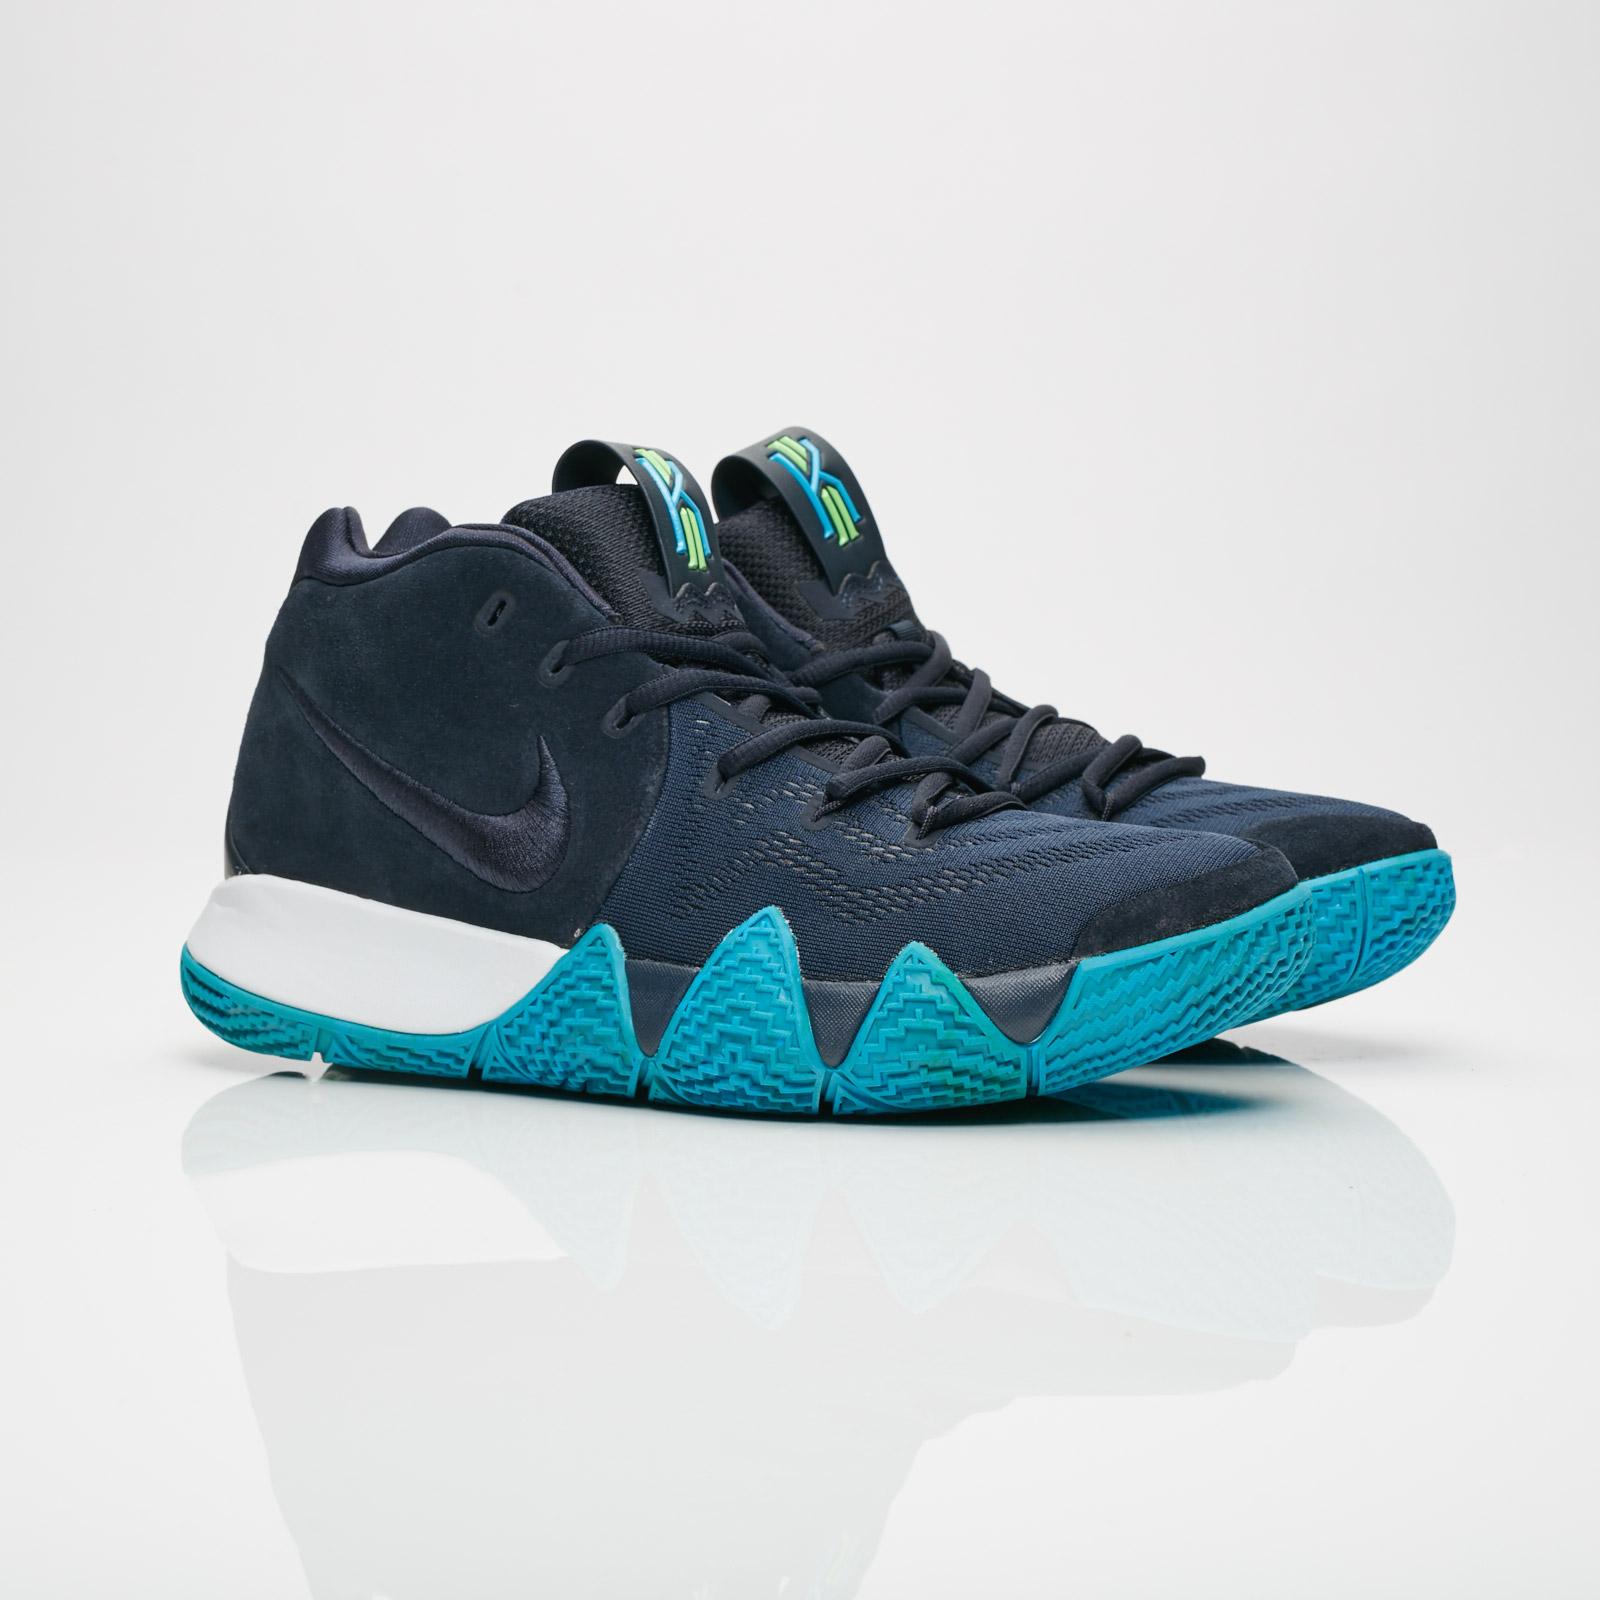 d394bd1ed1e6 Nike Kyrie 4 - 943806-401 - Sneakersnstuff